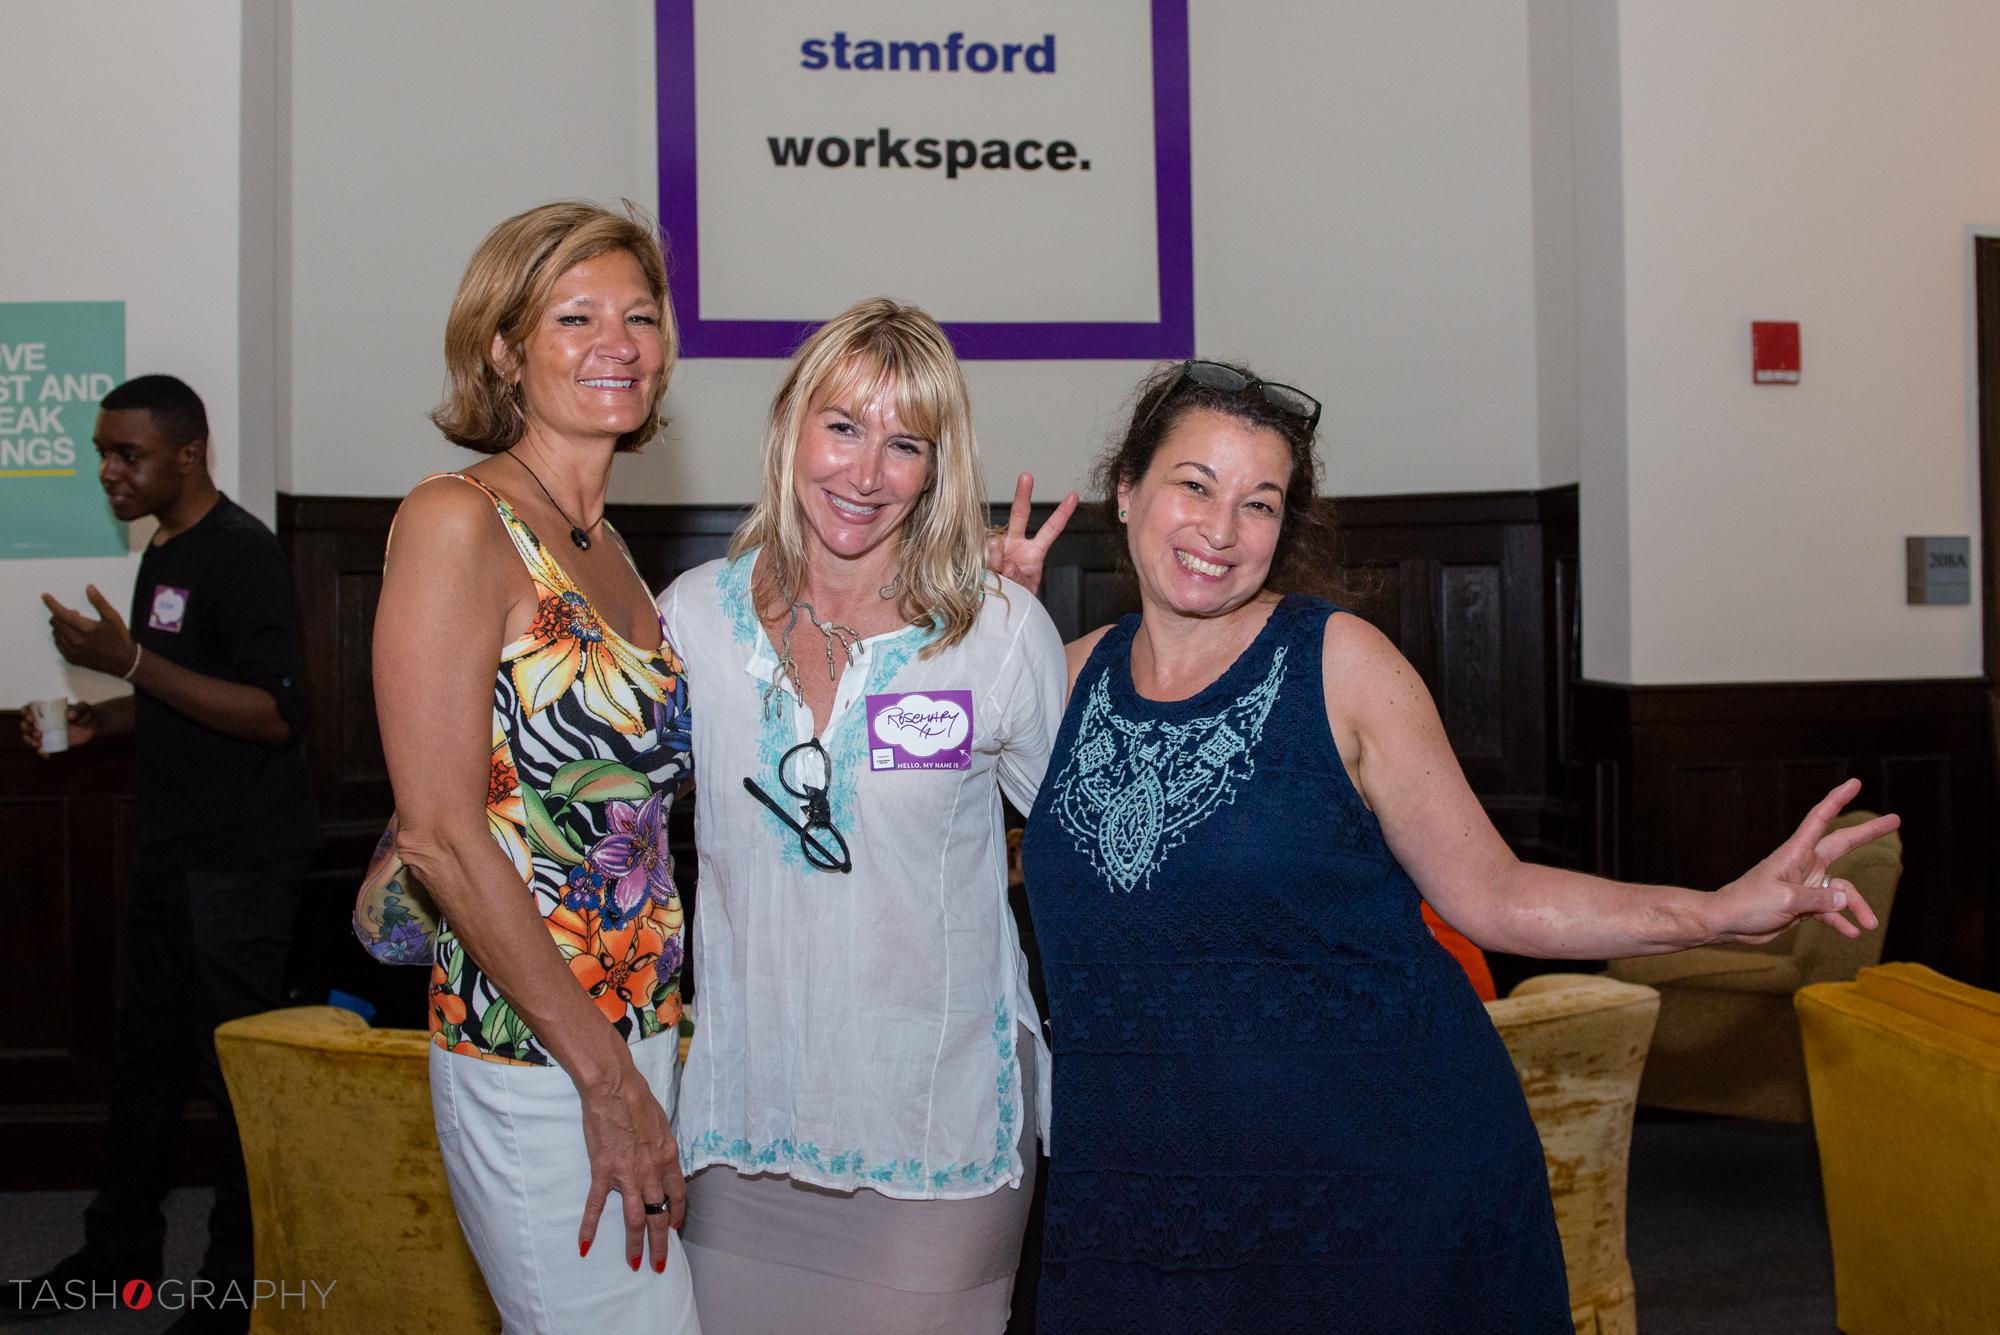 Carla Way, Rosemarie Taverna, and Liz T.